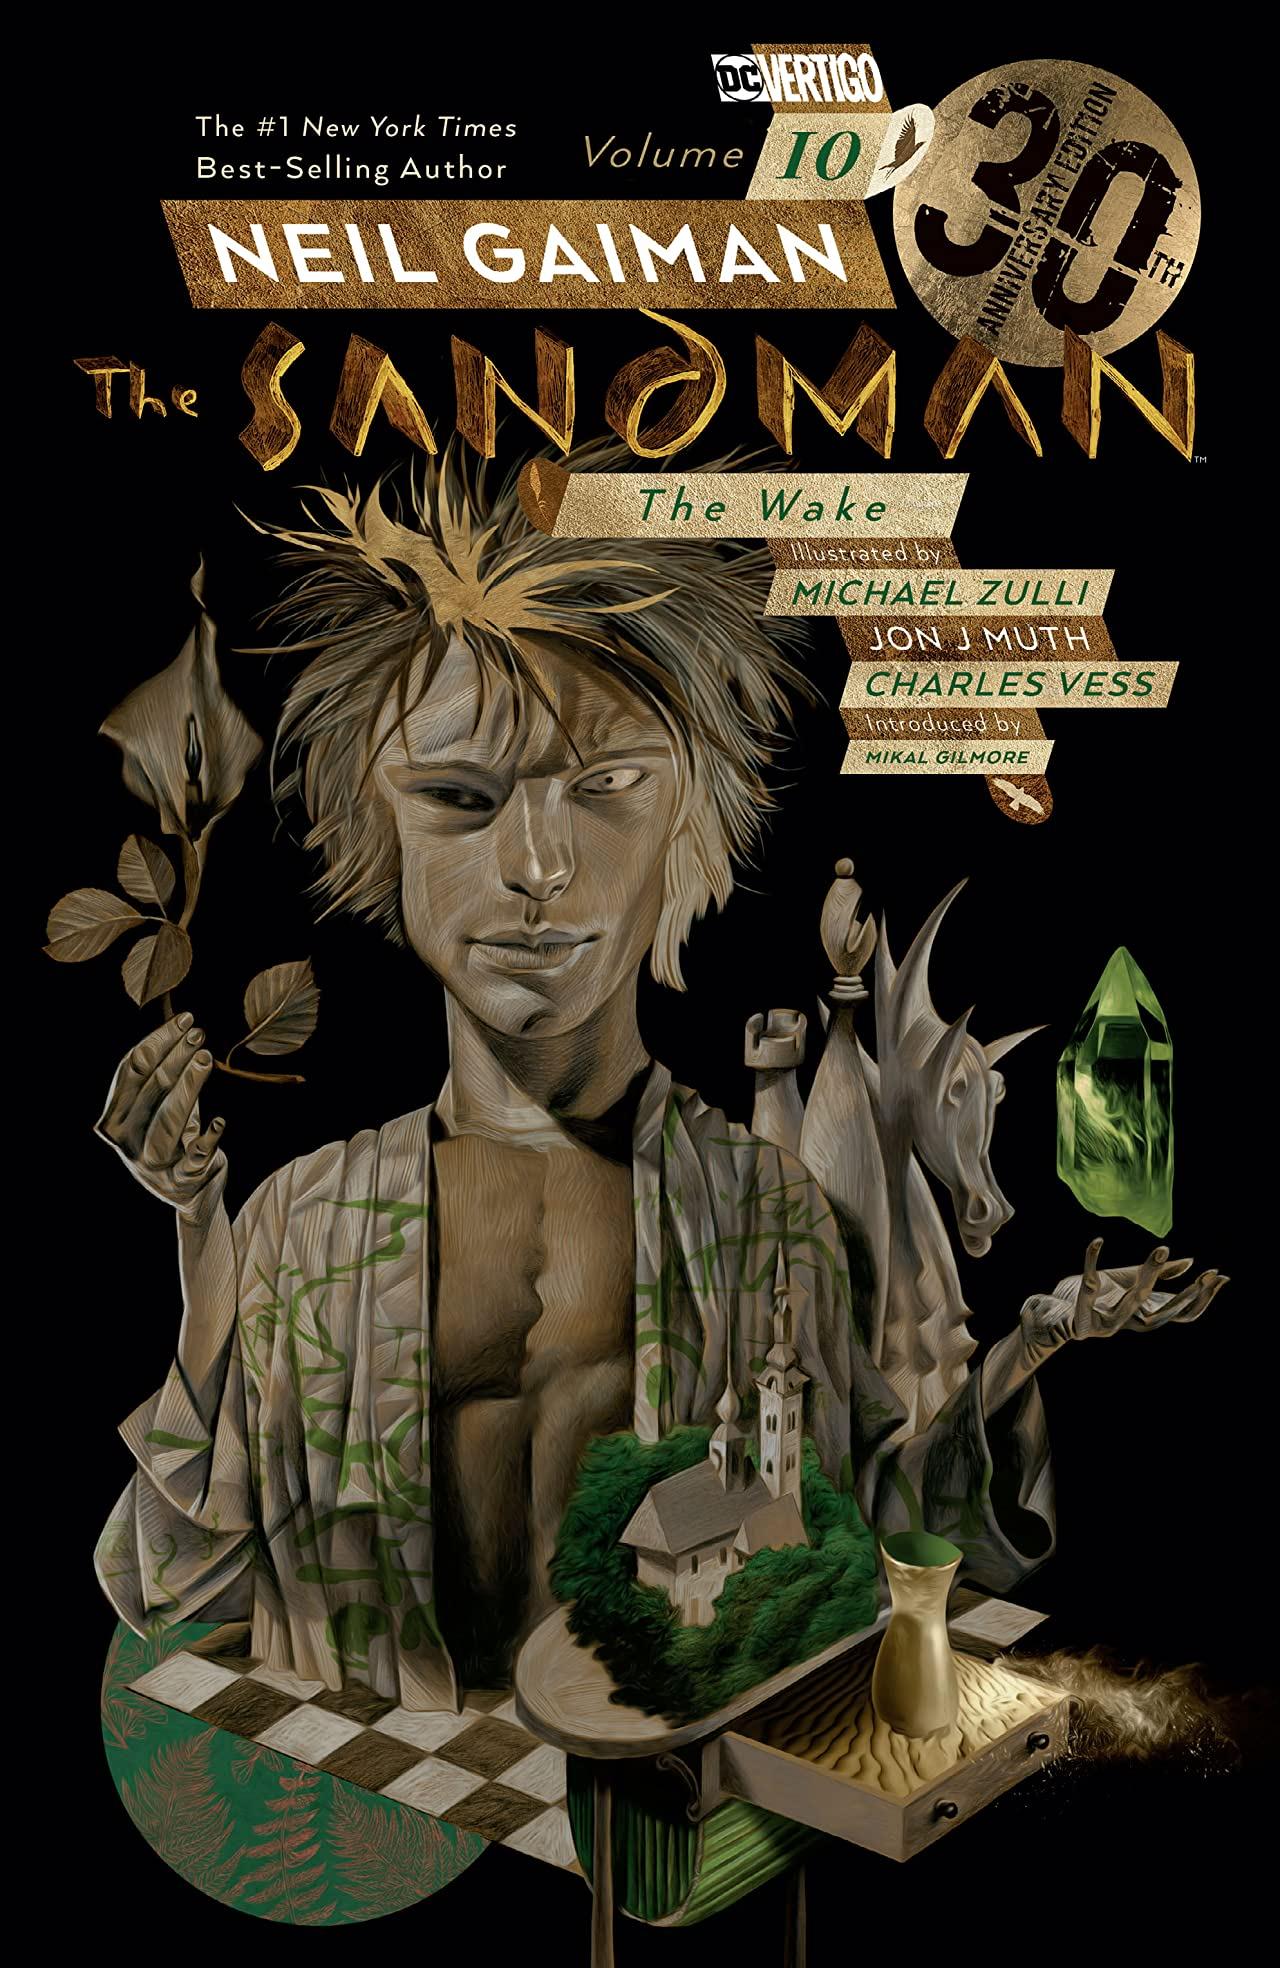 The Sandman, Vol. 10: The Wake - 30th Anniversary Edition by Neil Gaiman